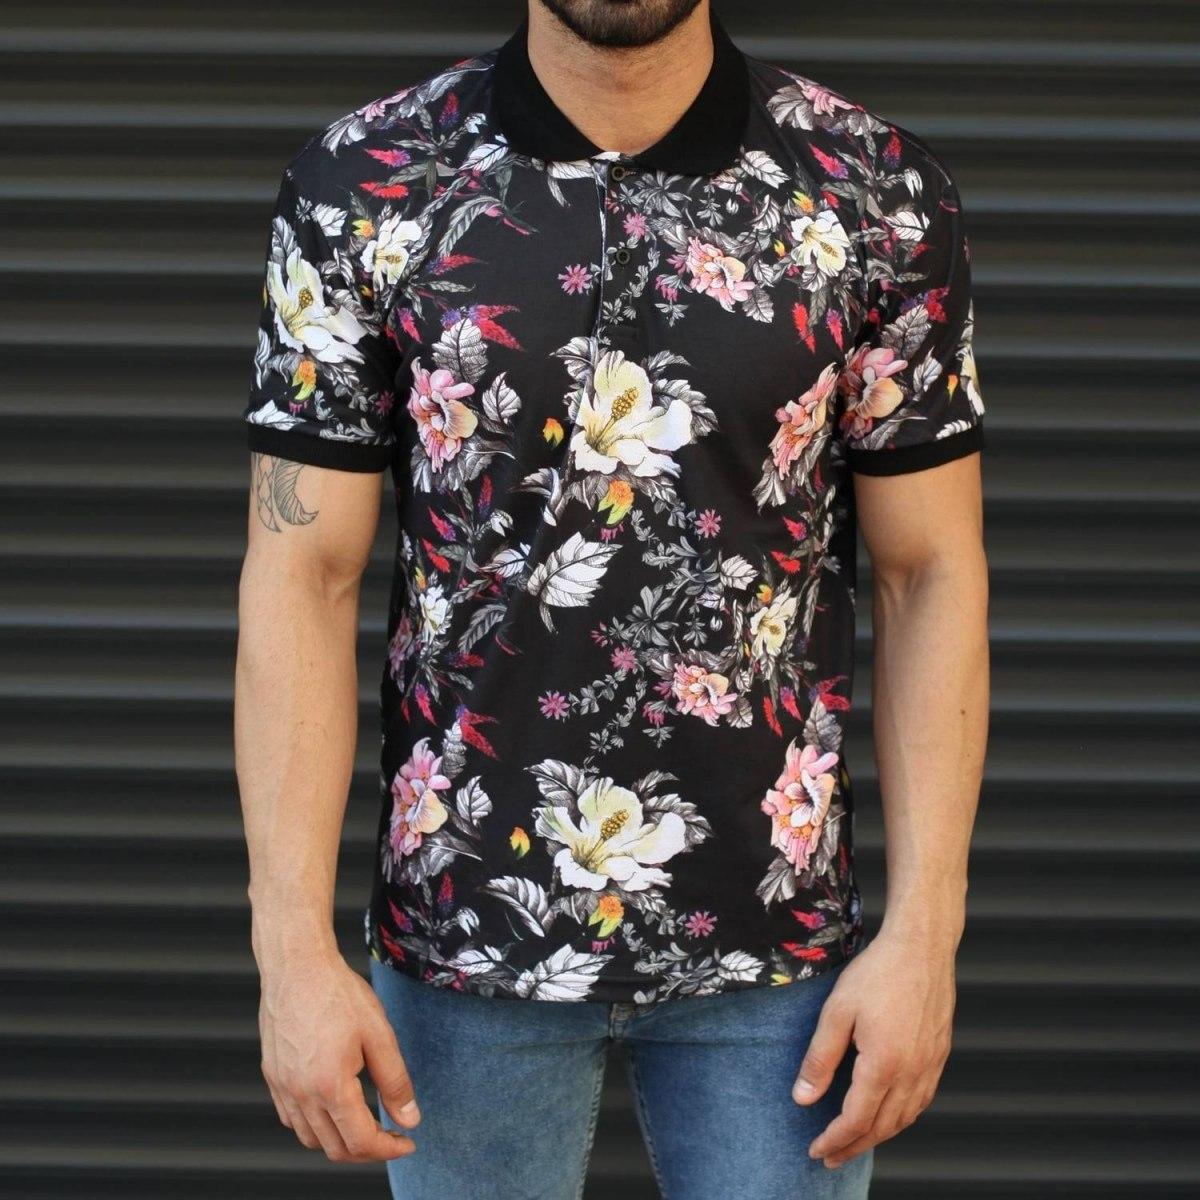 Men's Floral Pattern Colorful Polo T-Shirt Black